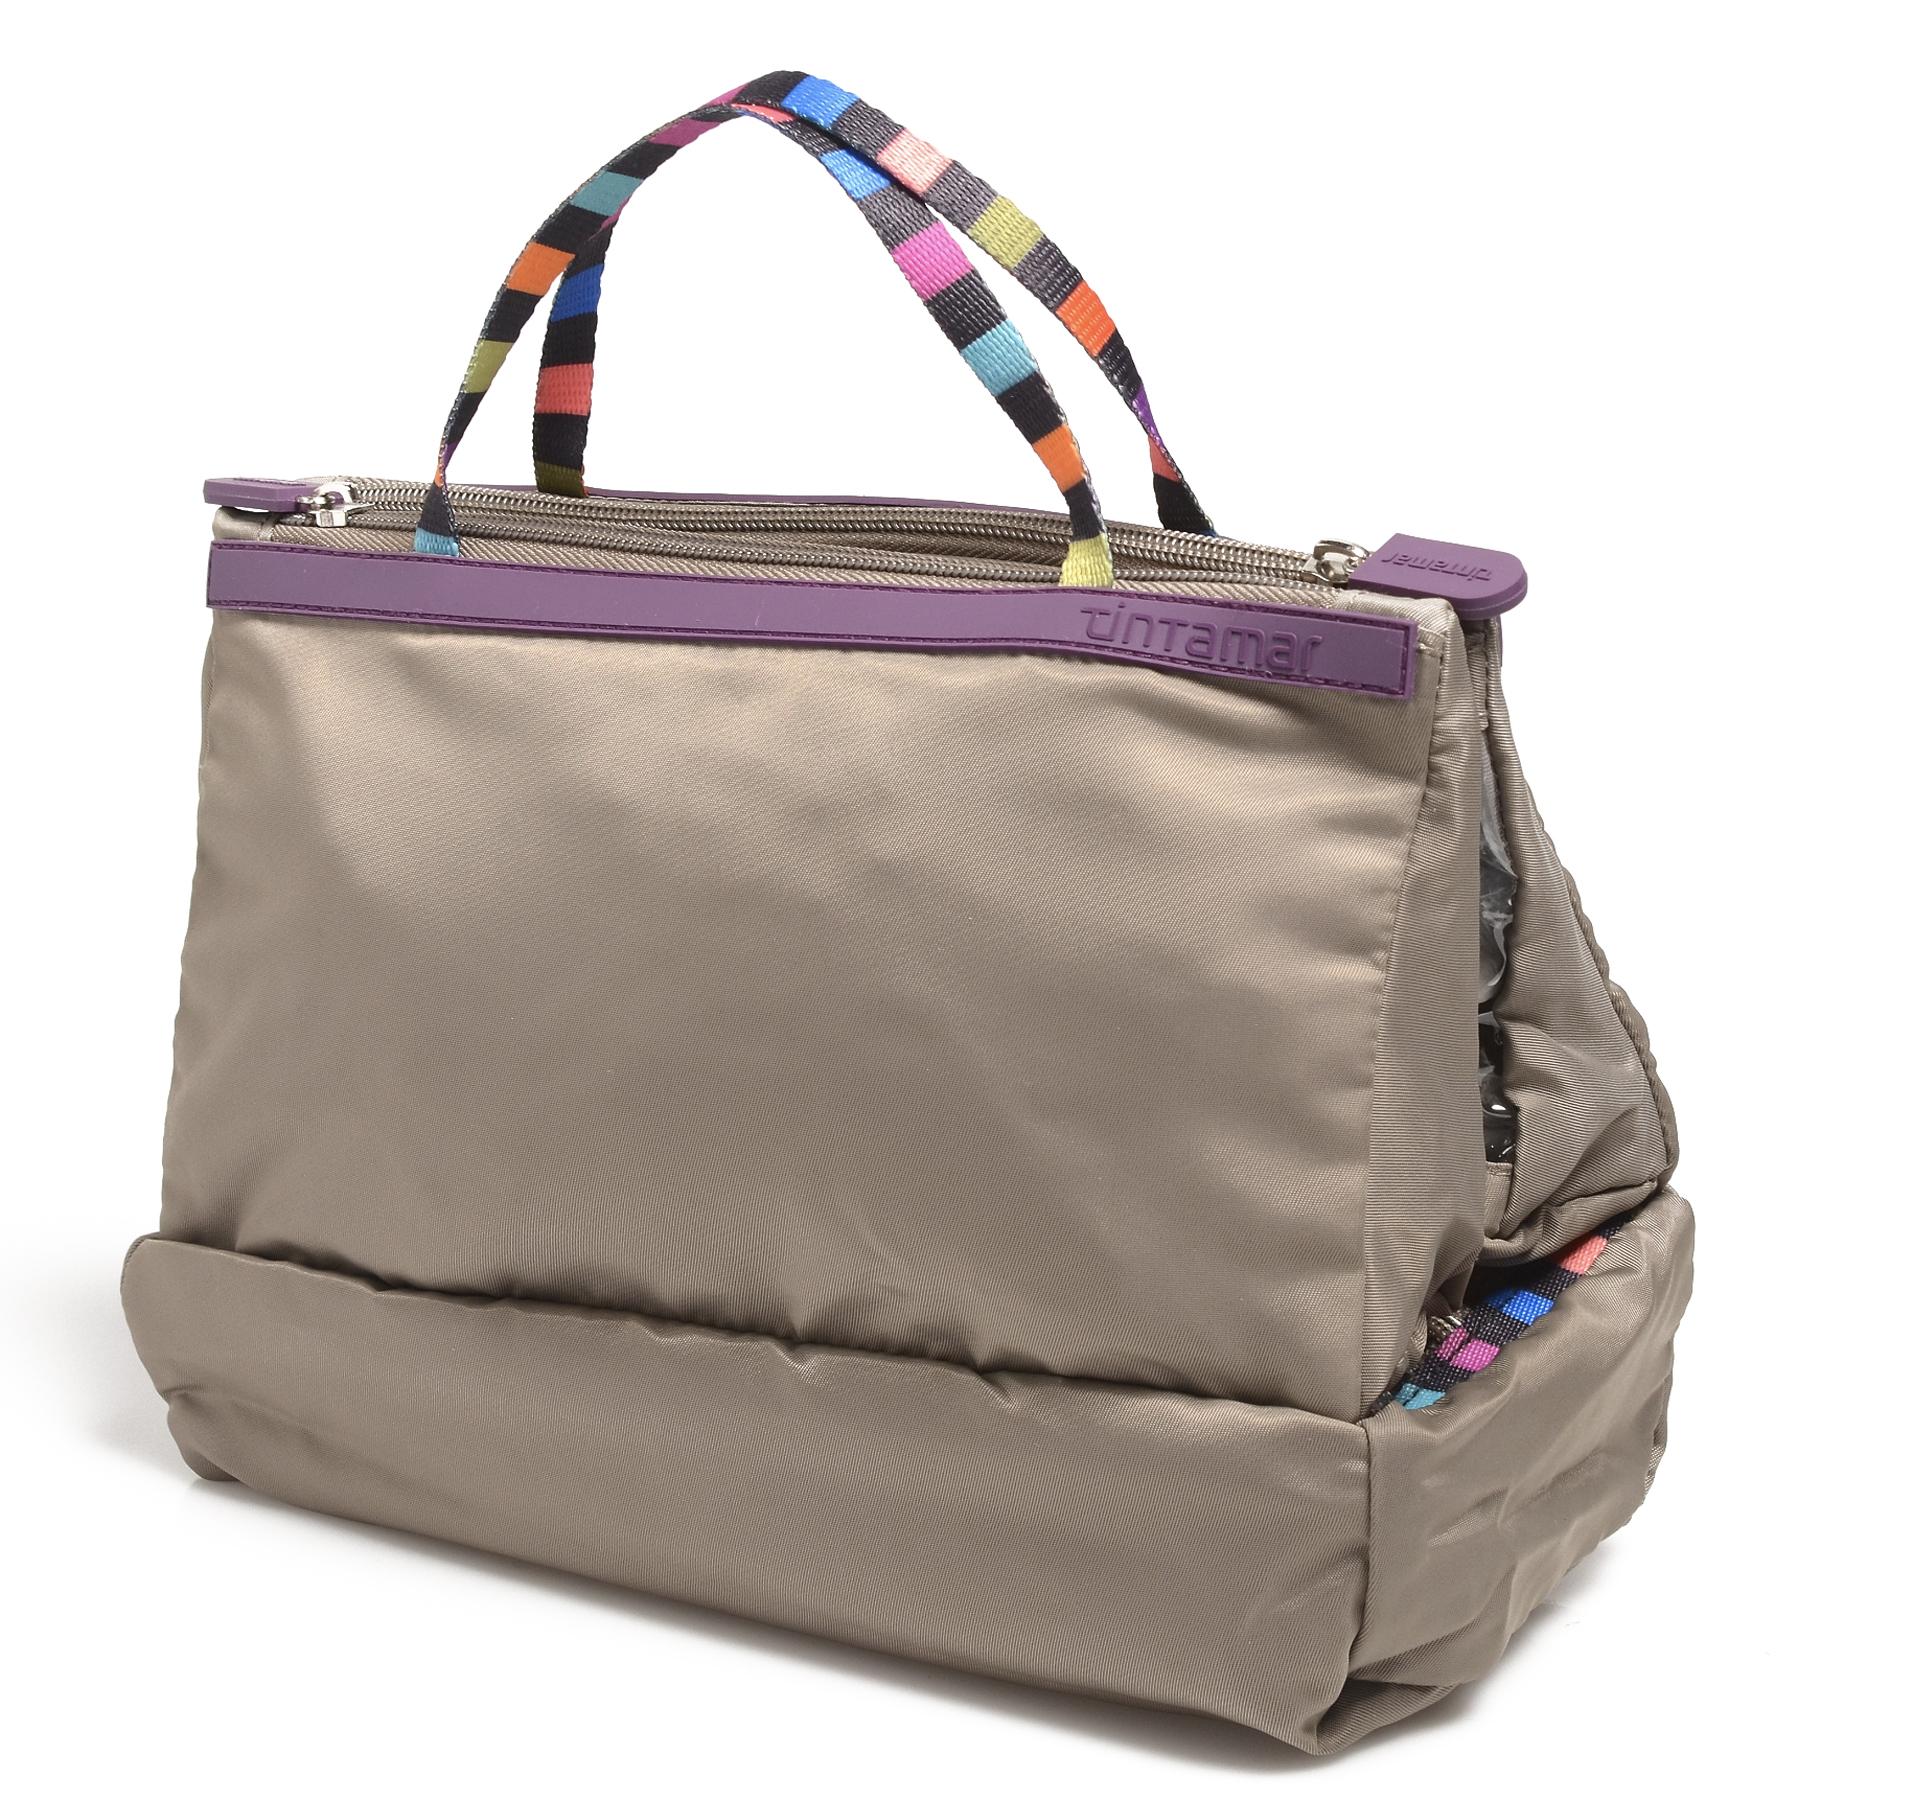 Tintamar Easy Travel Vanity Bag Organiser Taupe Rrp 163 33 5 2585 9 1 The Total Price For Buy It